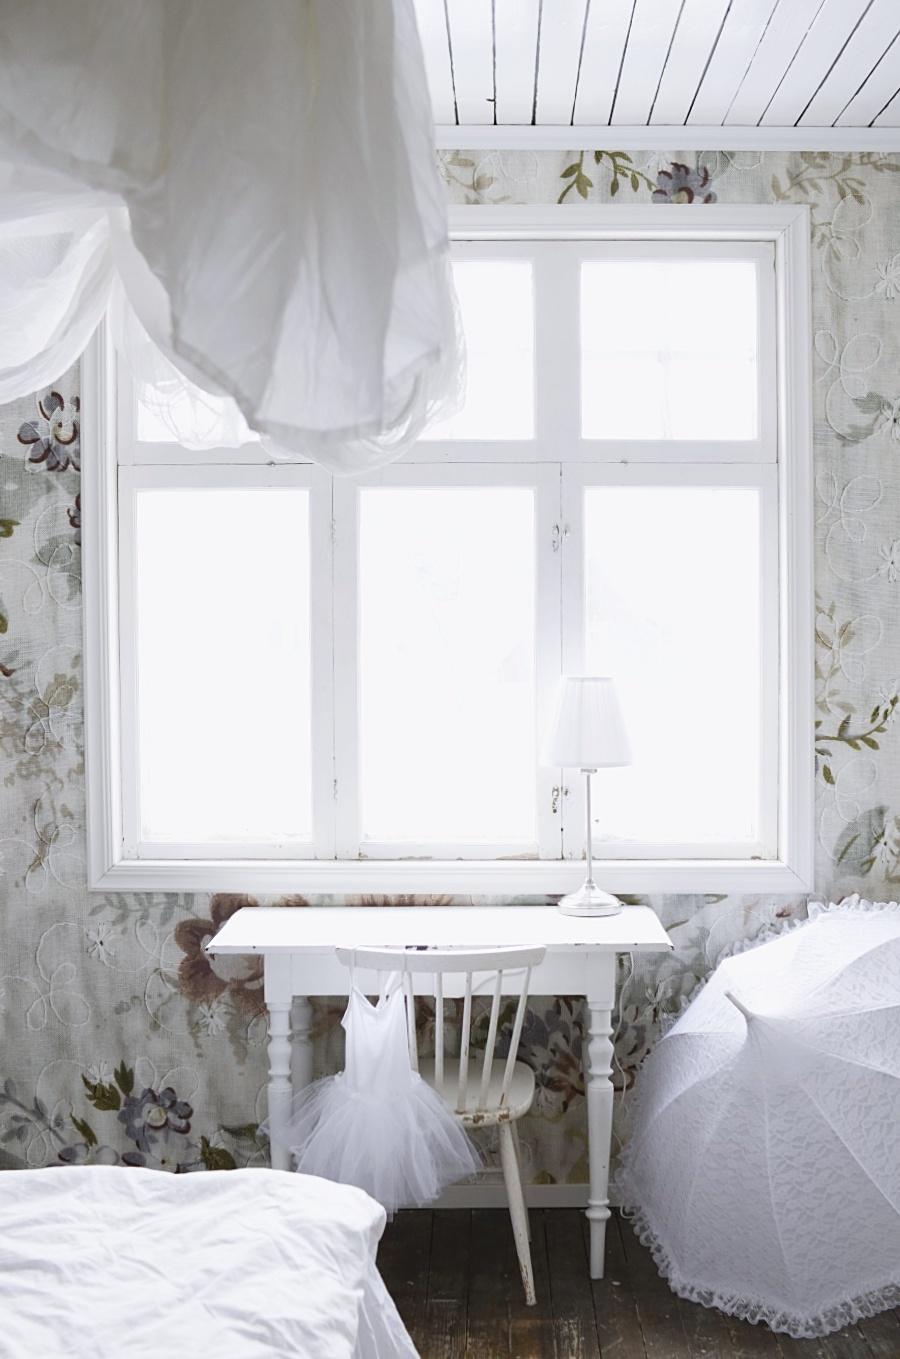 mr perswall, blossom soft, barnrum, blommig tapet, vintage tapet, fototapet, inredning, fotograf, dalarna, grängesberg